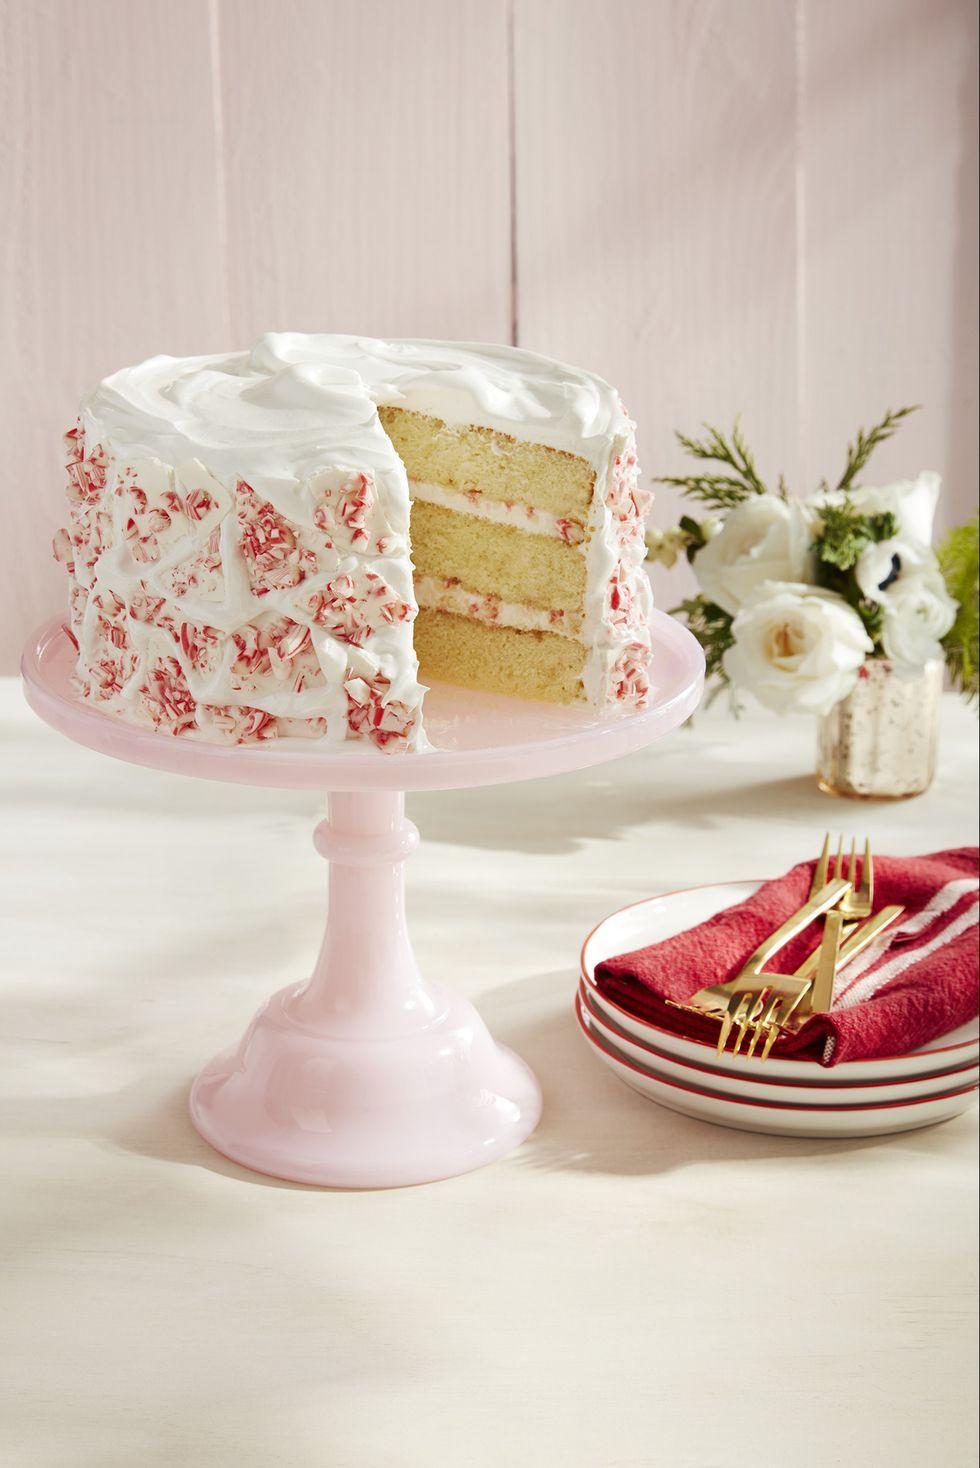 Strange 16Th Birthday Cake Table Decoration Ideas The Cake Boutique Funny Birthday Cards Online Kookostrdamsfinfo